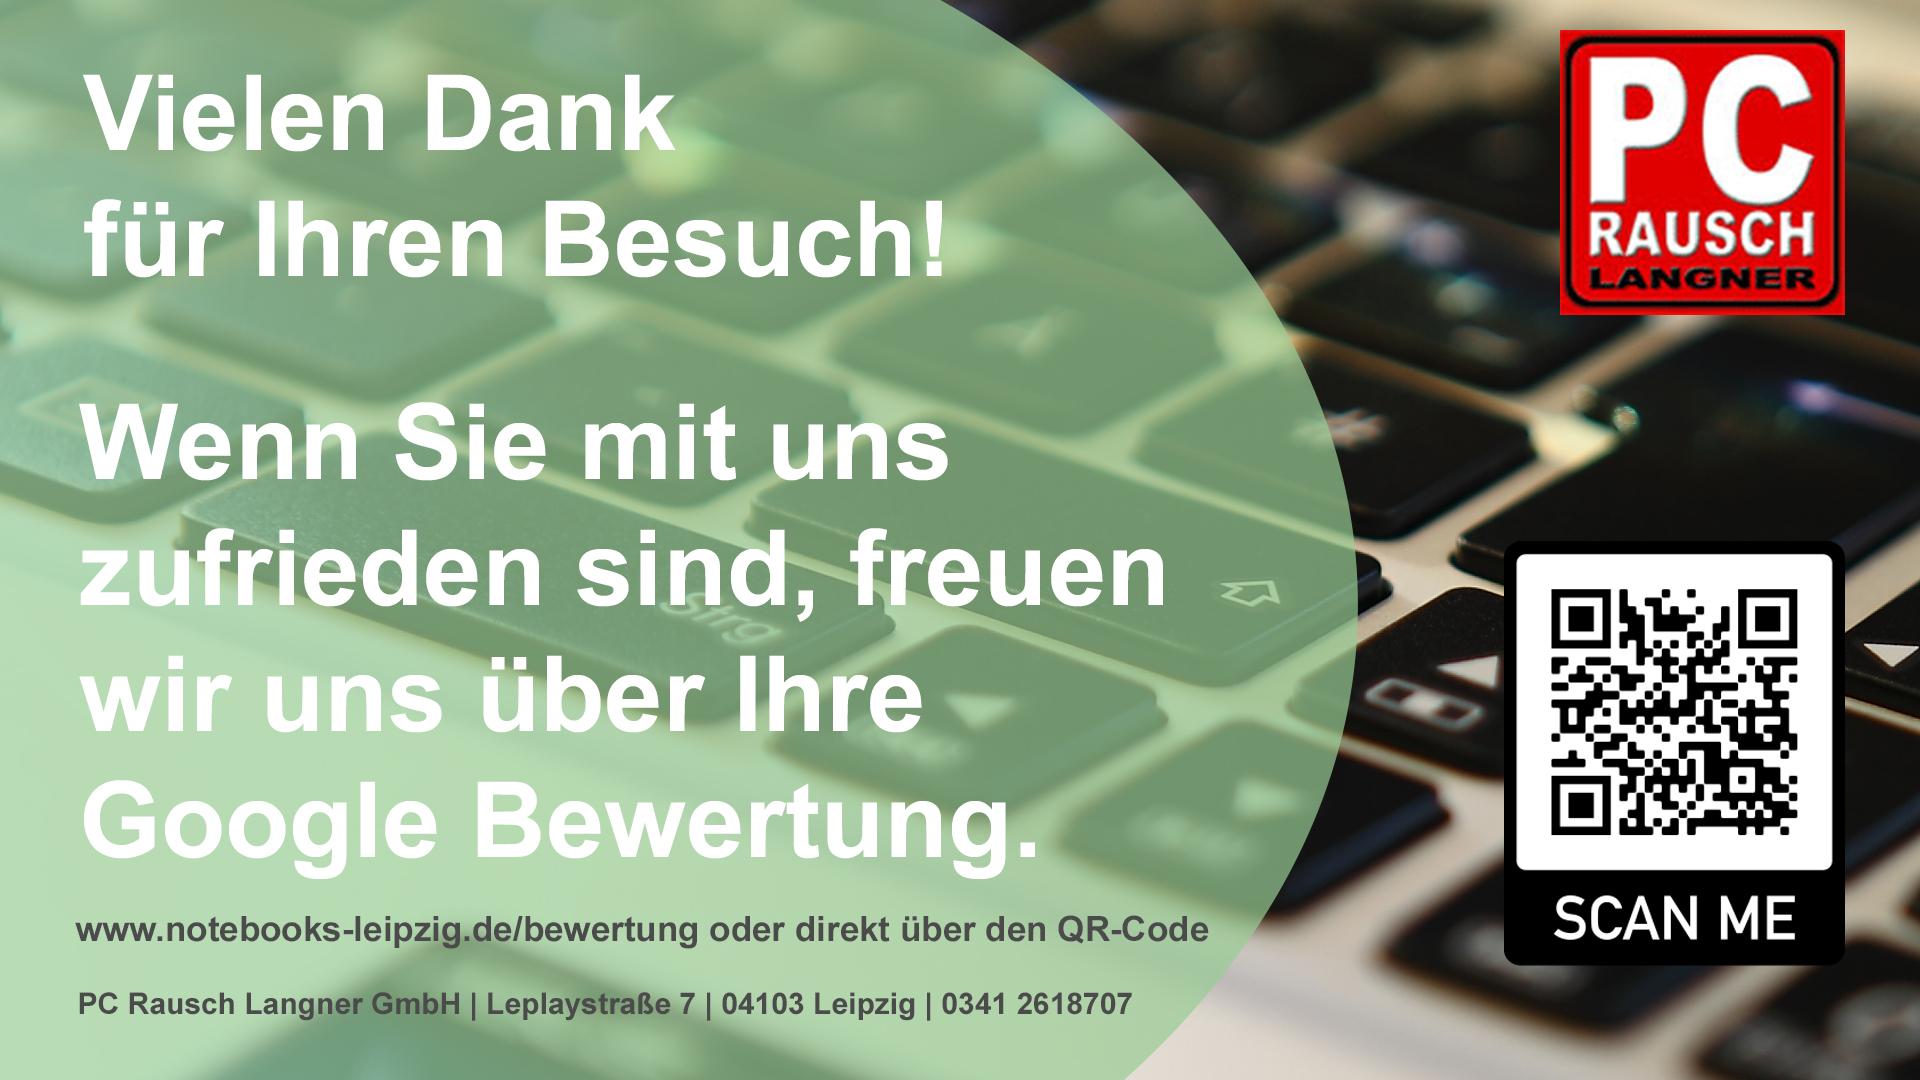 Notebooks-leipzig